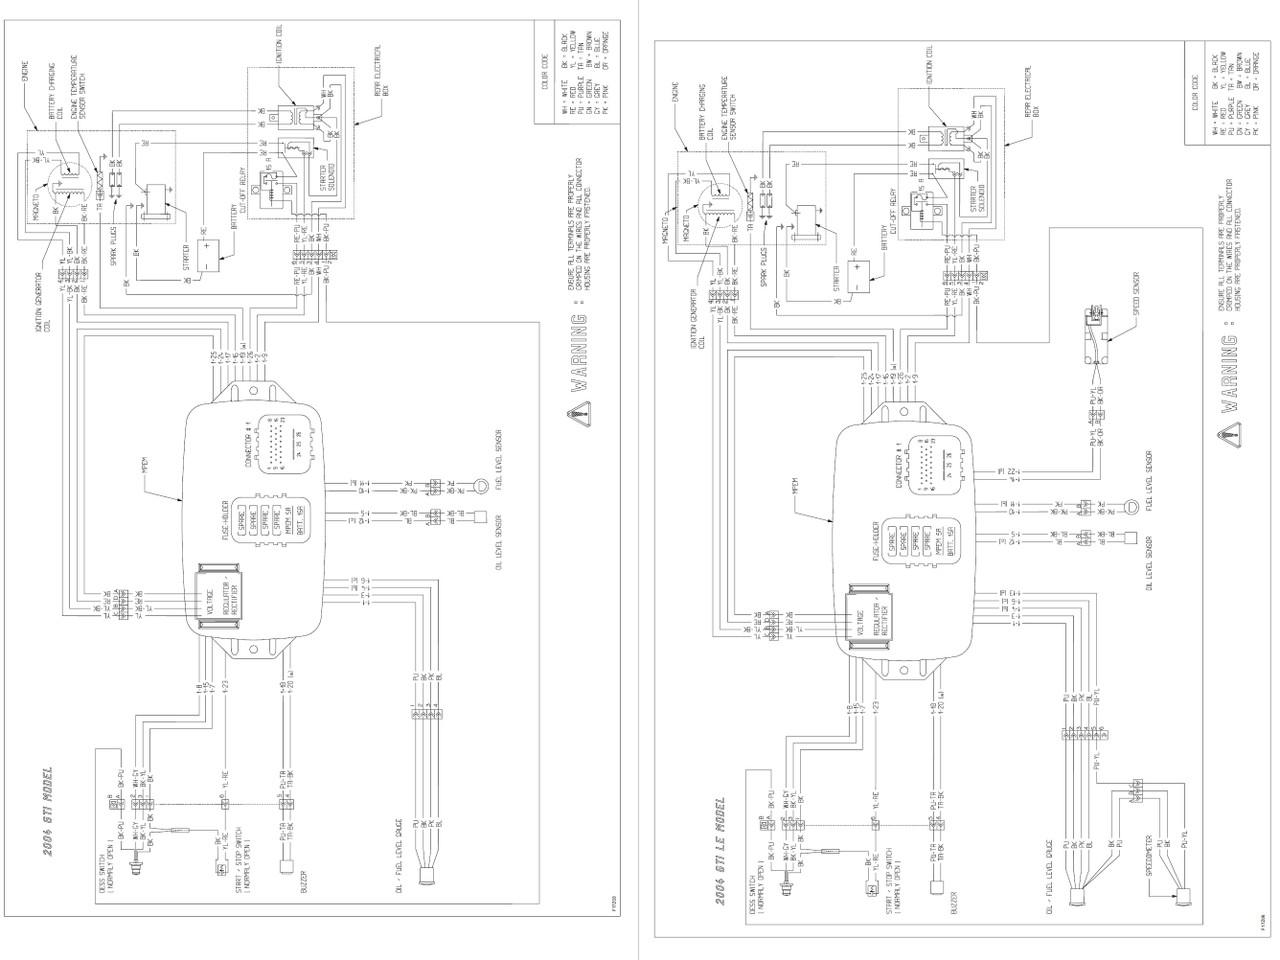 Sea-Doo 2004 GTI RFI LE Jetski Service Manual